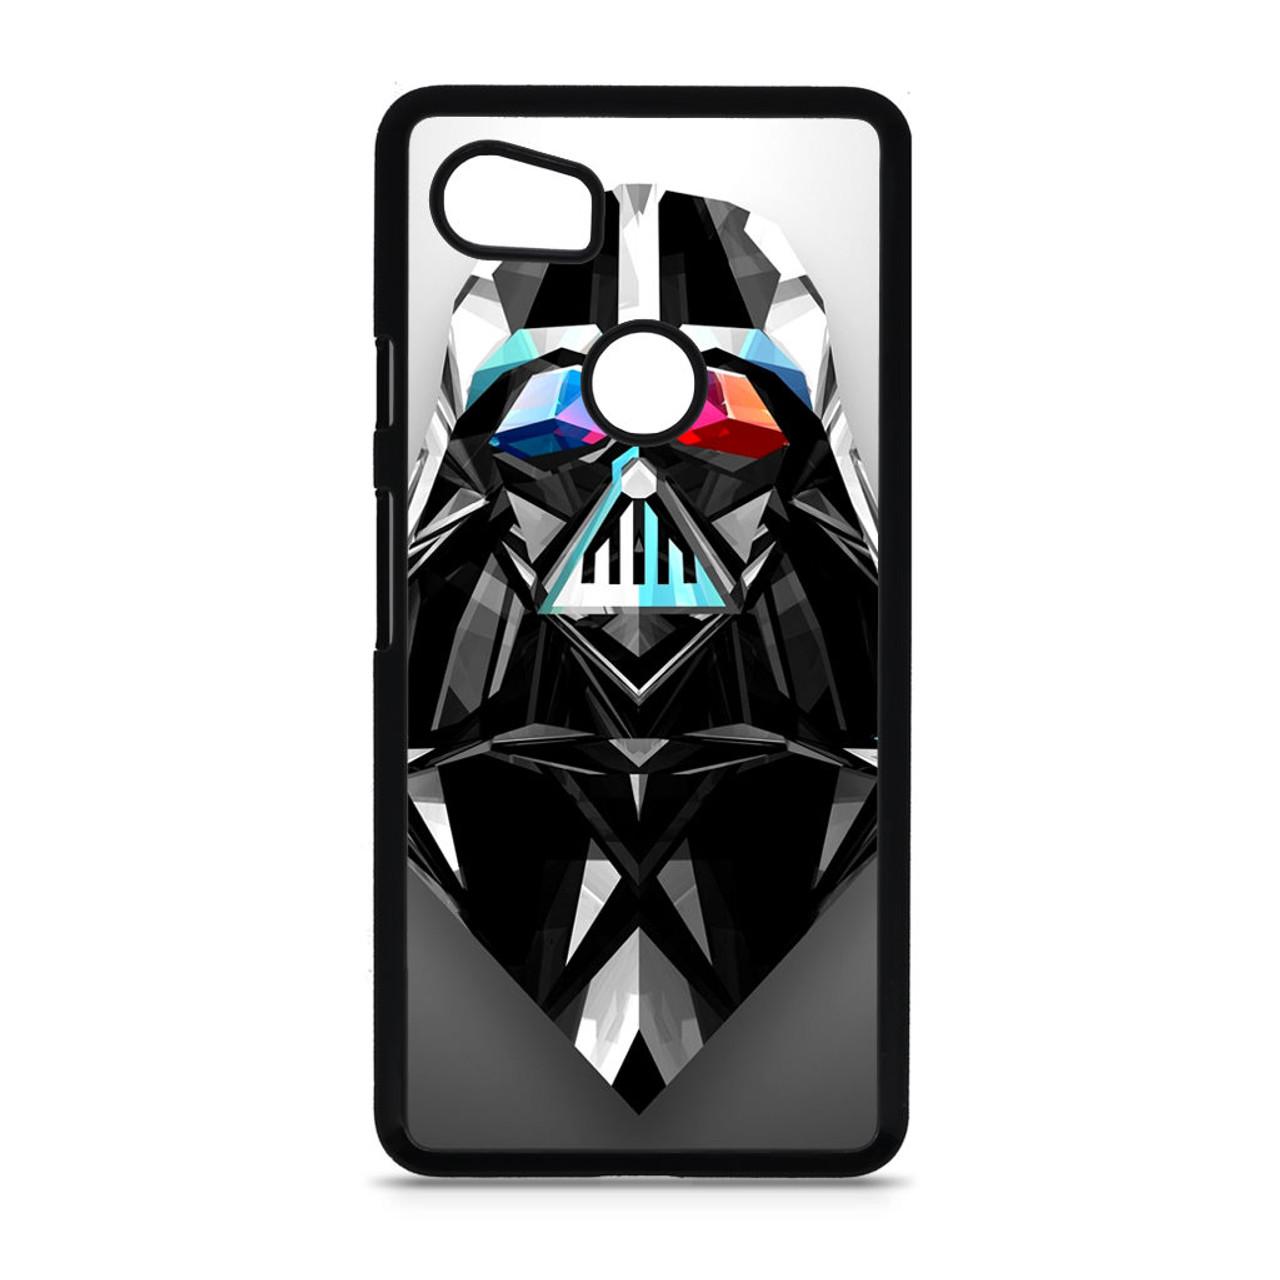 Movie Starwars Darth Vader Artistic Geometric Google Pixel 2 Xl Case